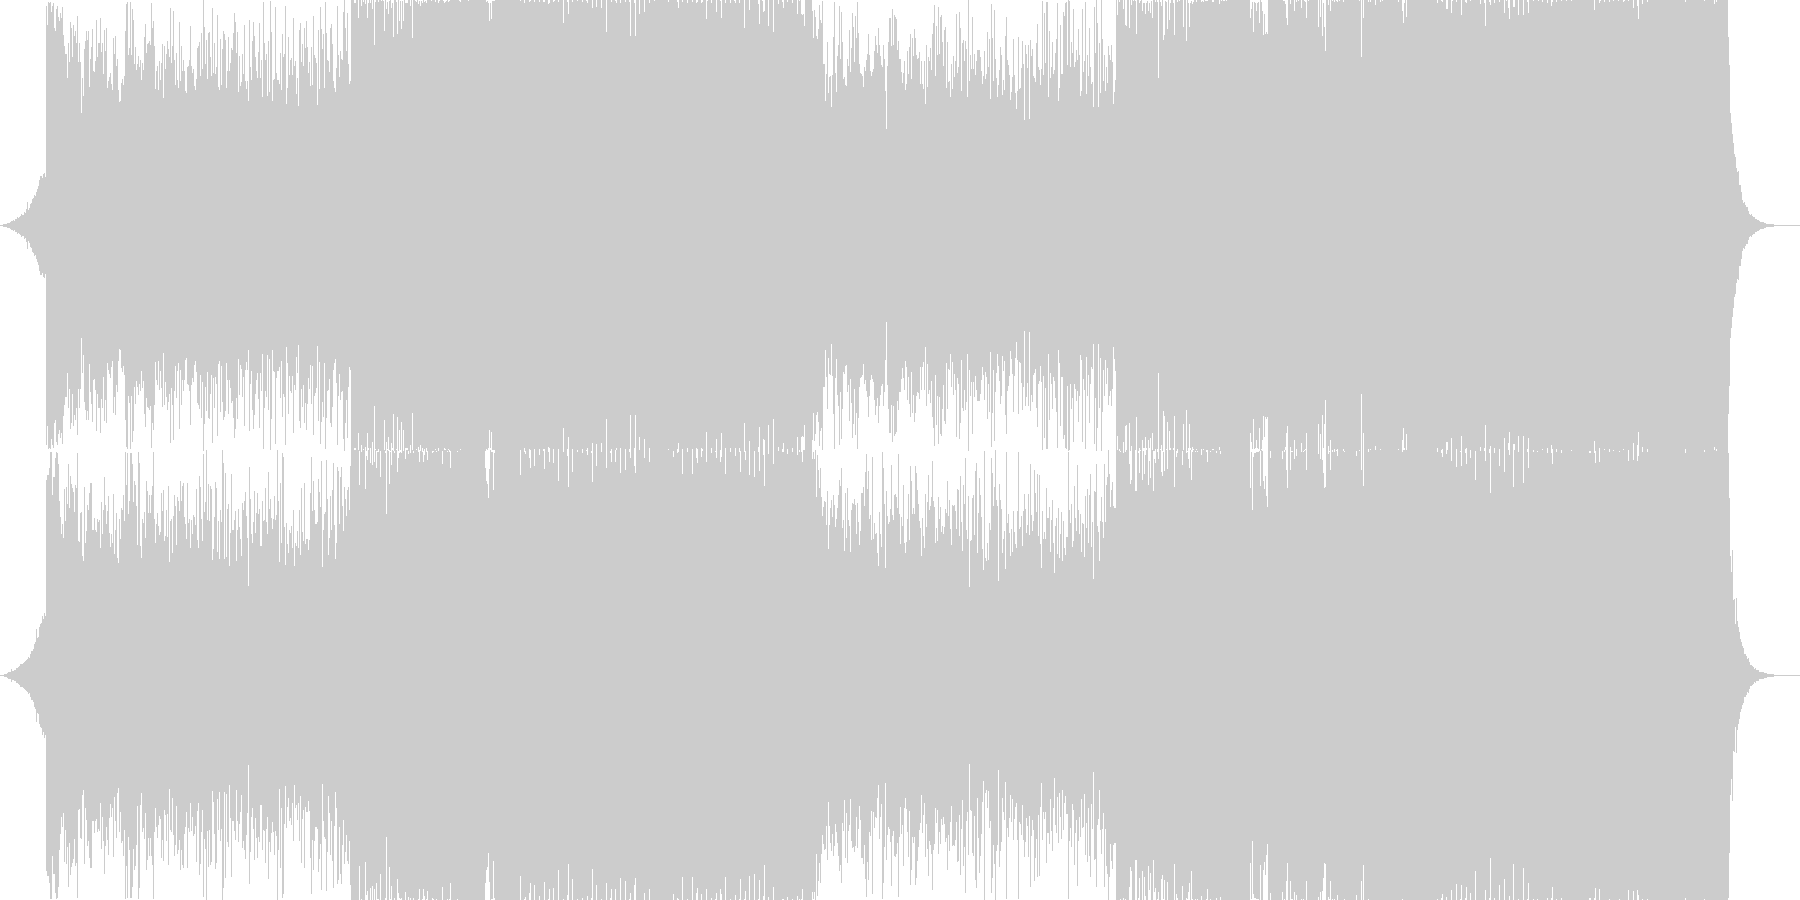 Western music K-Pop Cool house EDM's unreproduced waveform